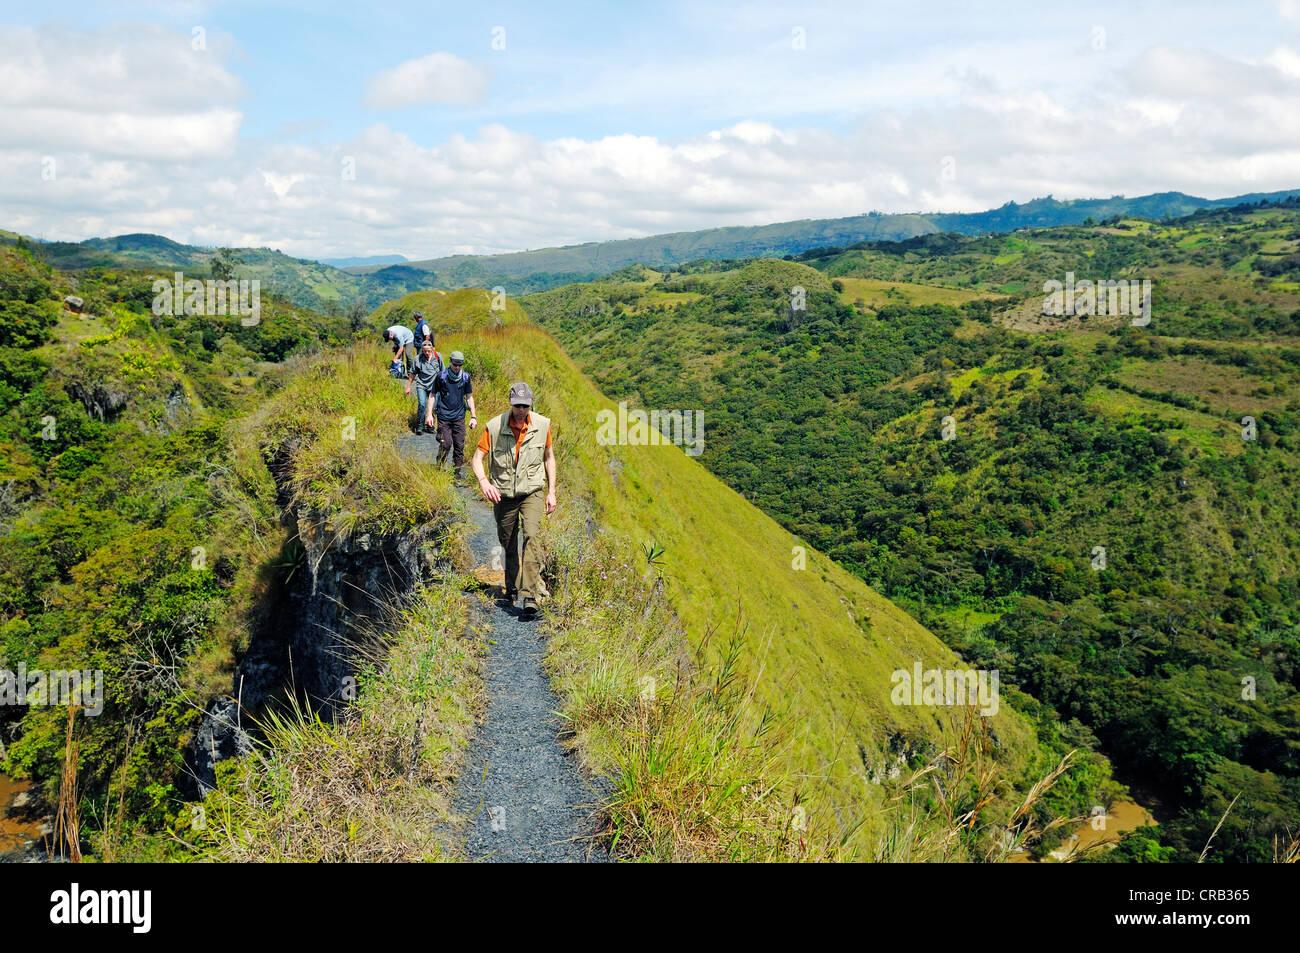 Hikers on Paso del Angel, a narrow pass in Santa Sofia, Villa de Leyva, Boyaca department, Colombia, South America - Stock Image